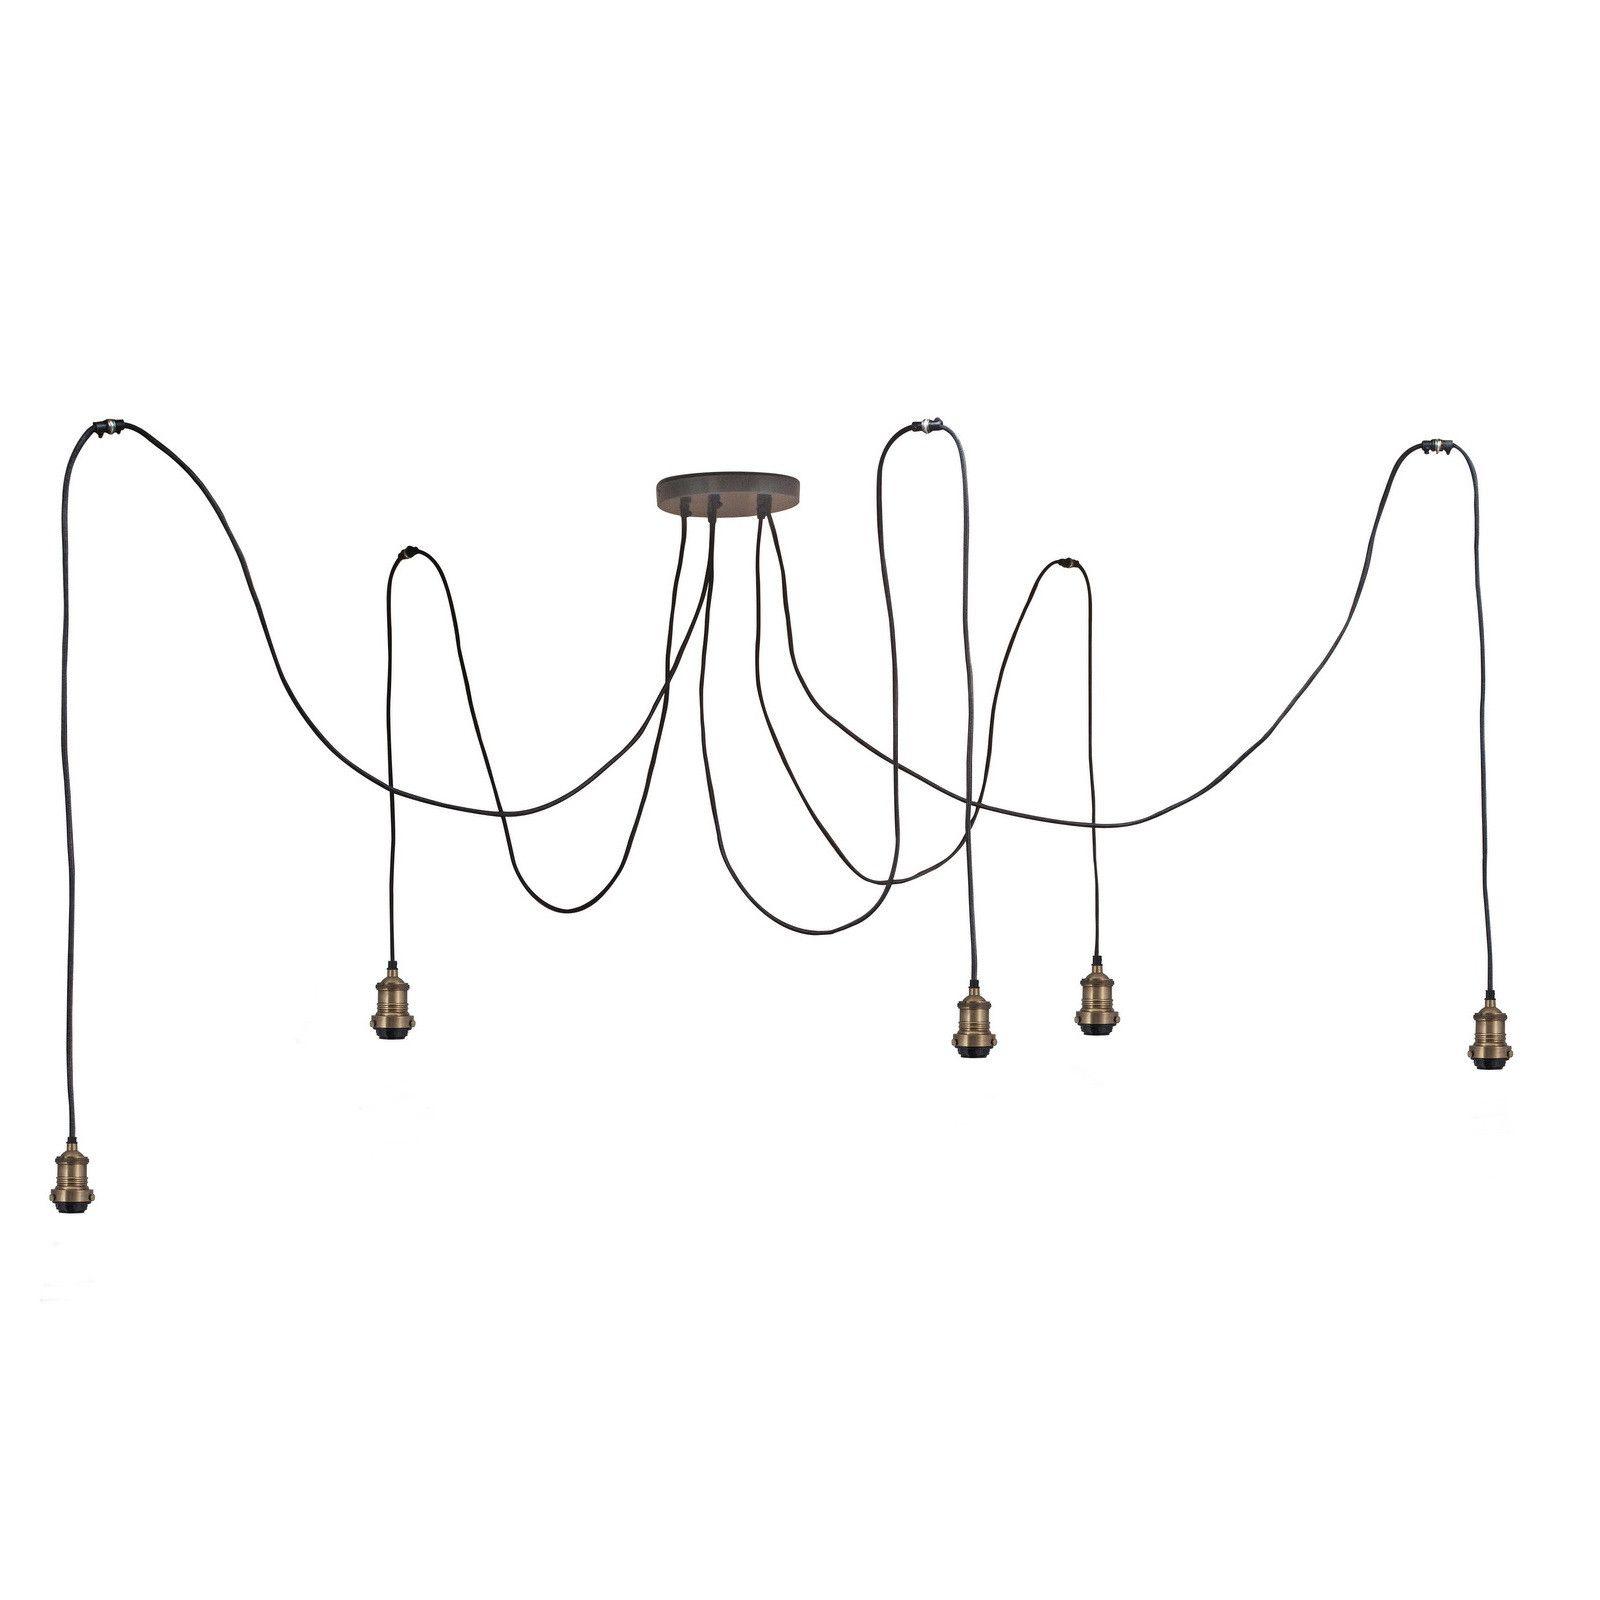 Brooklyn Vintage 5 Wire Pendant Light | Wire pendant, Pendant ...